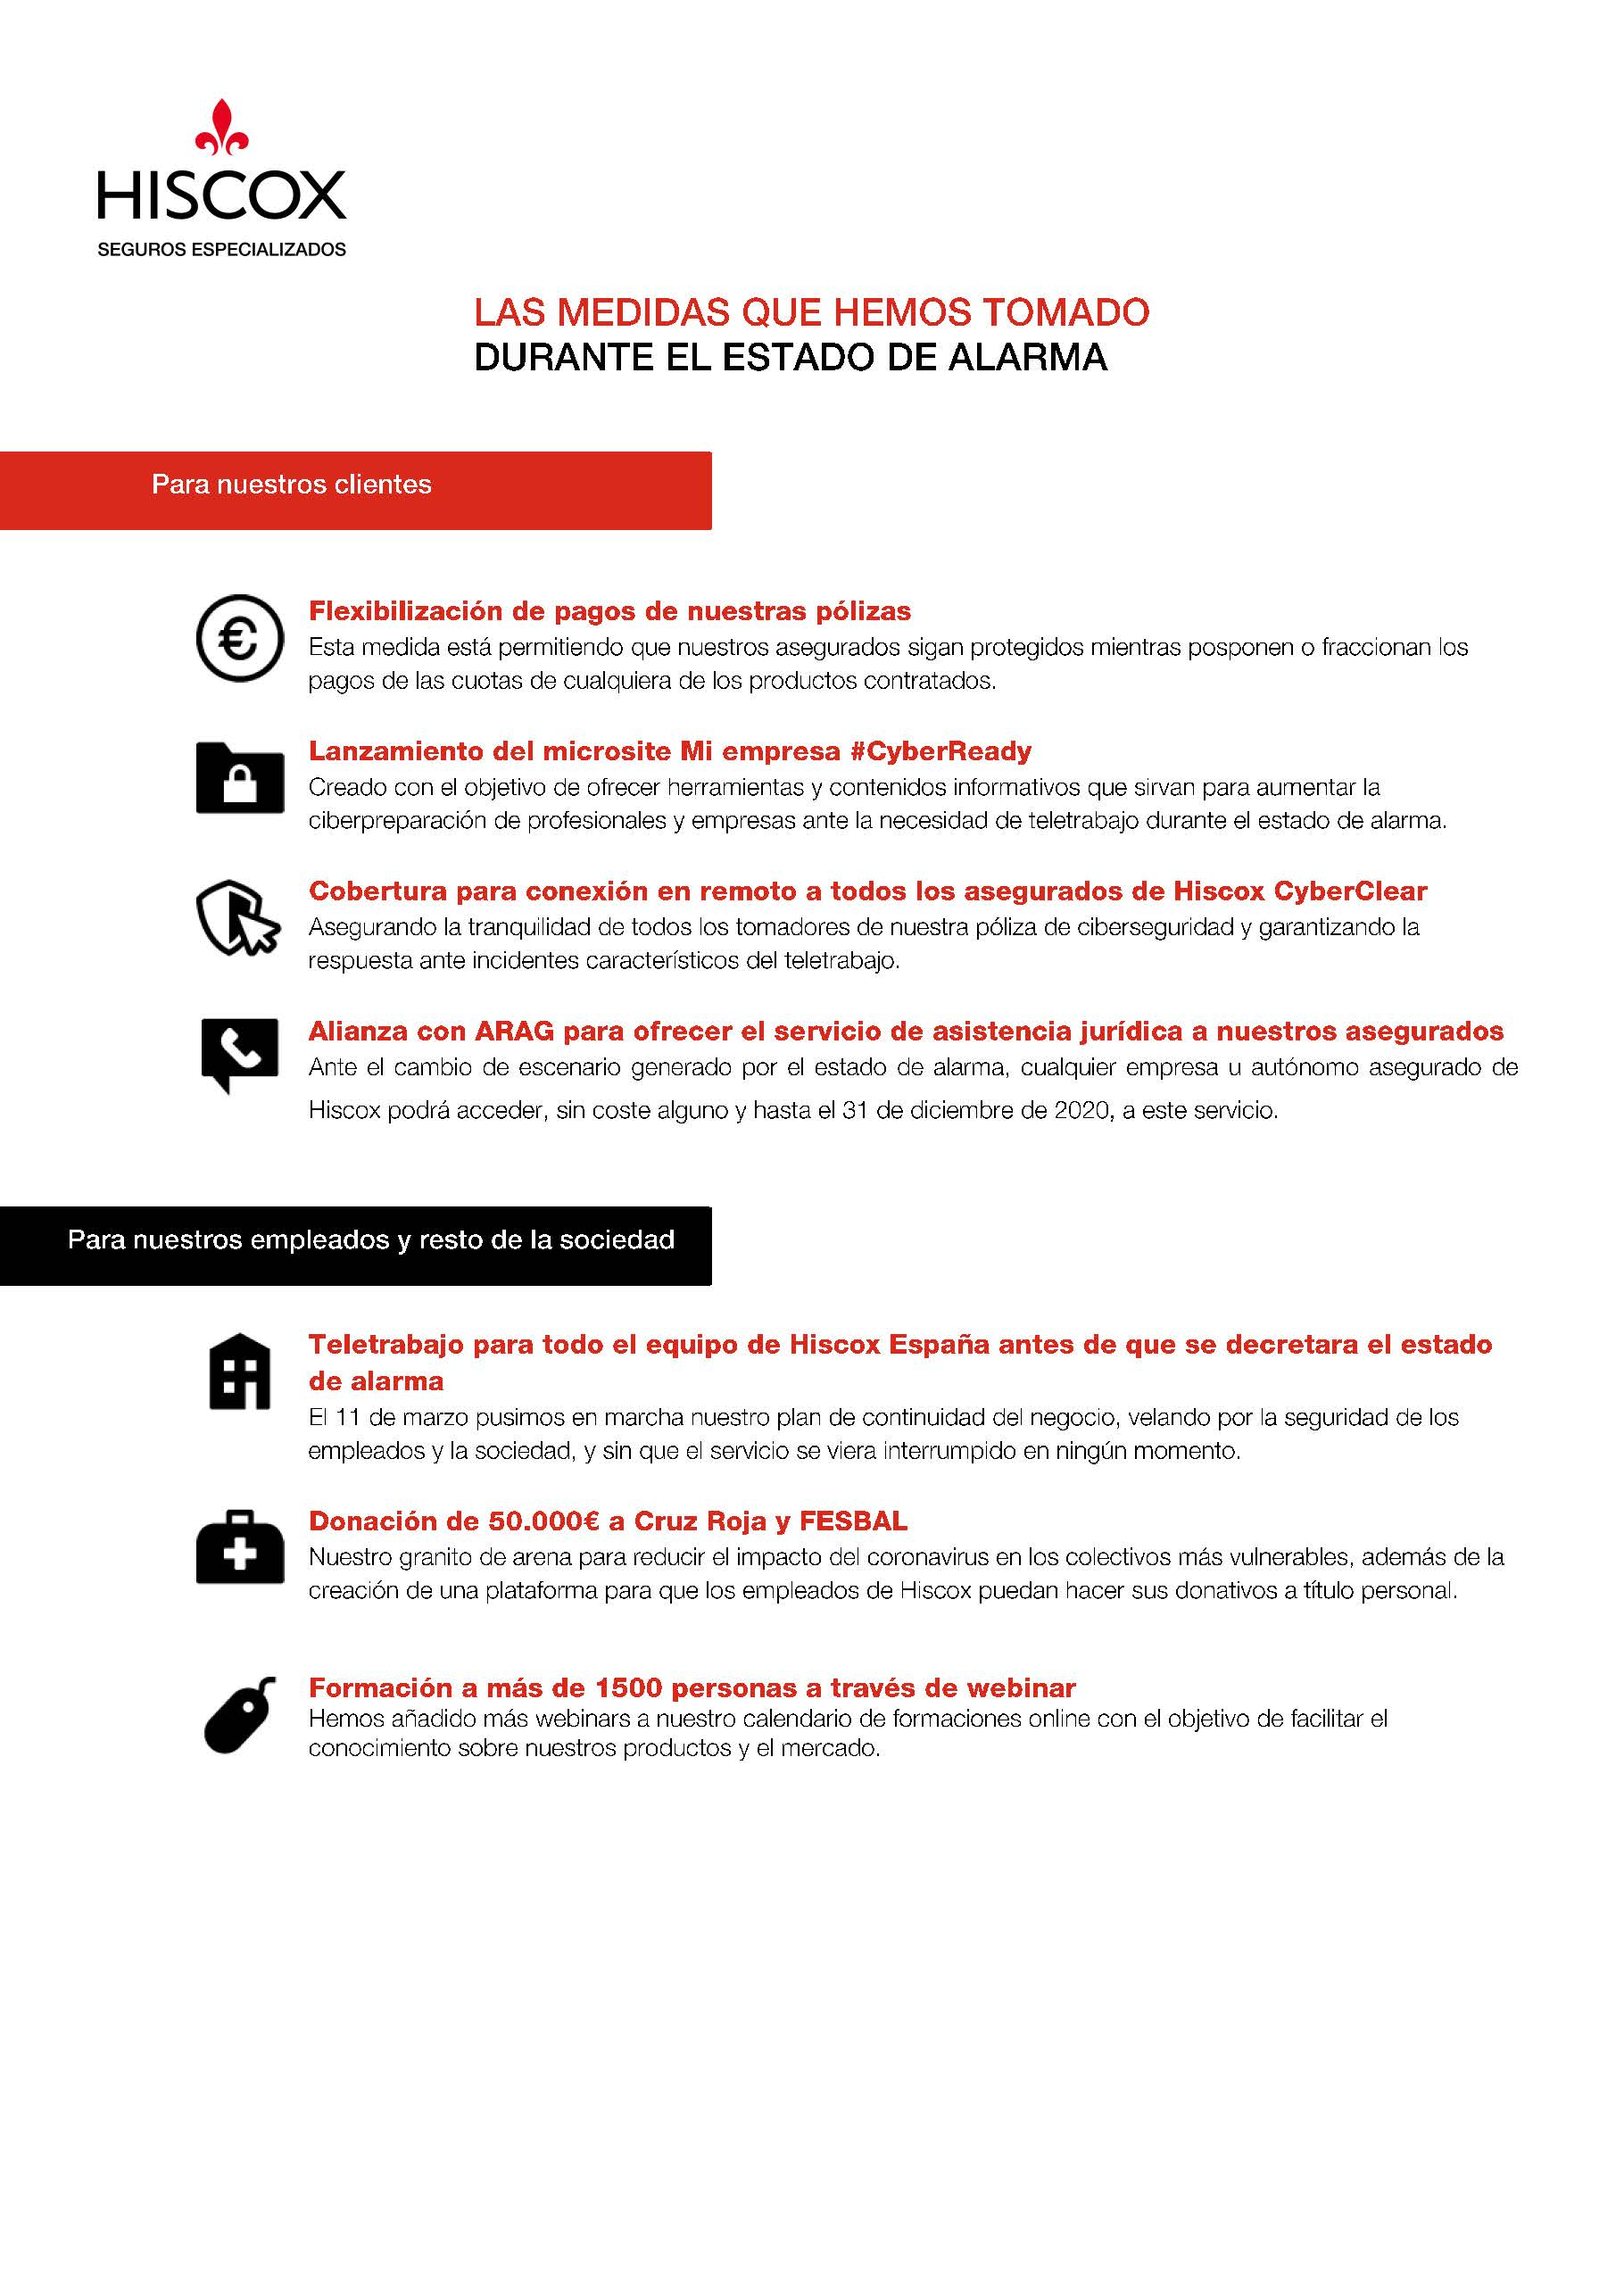 Infografia Medidas Hiscox